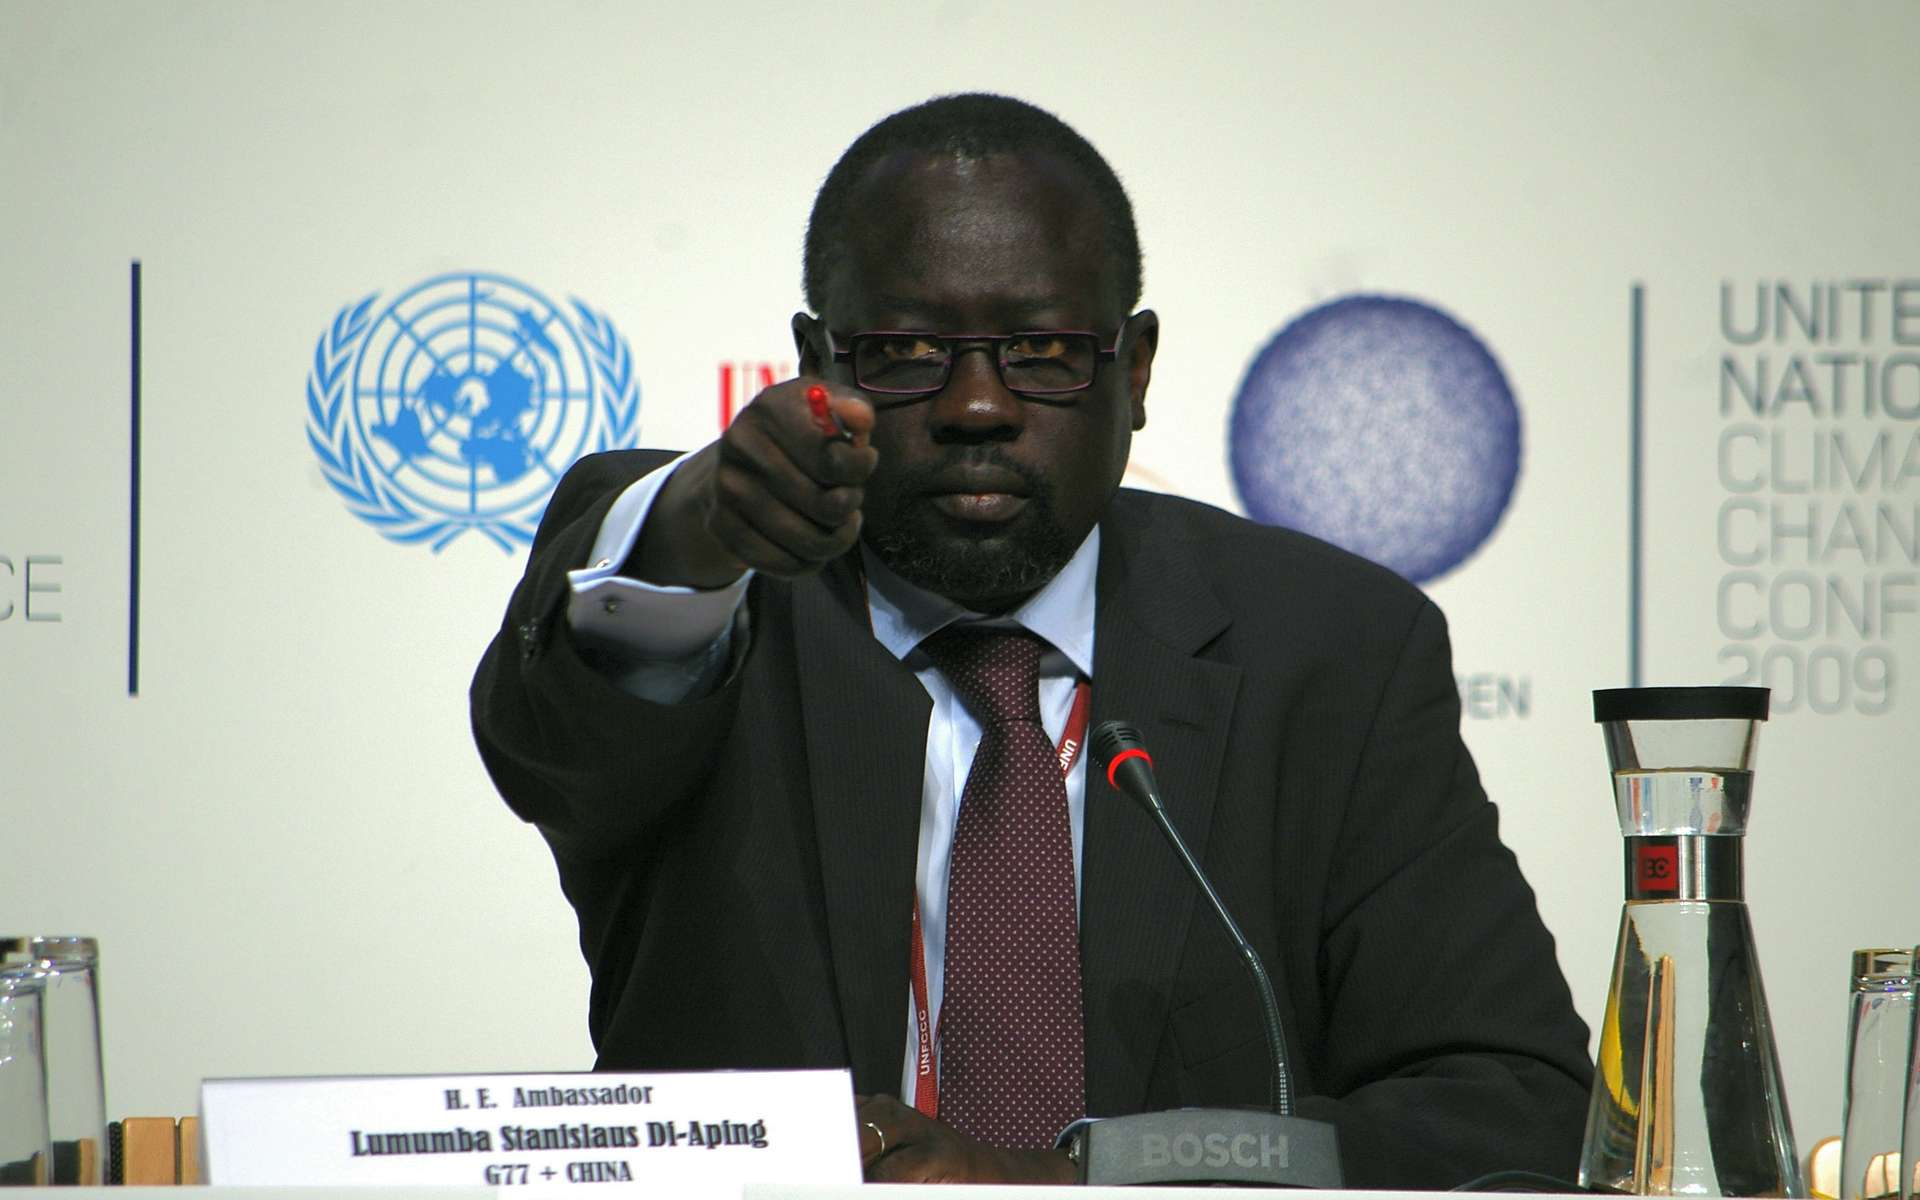 Stanislaus-Kaw Di-Aping, ambassadeur du Soudan aux Nations Unies. © Delphine Rigaud/Durable.com